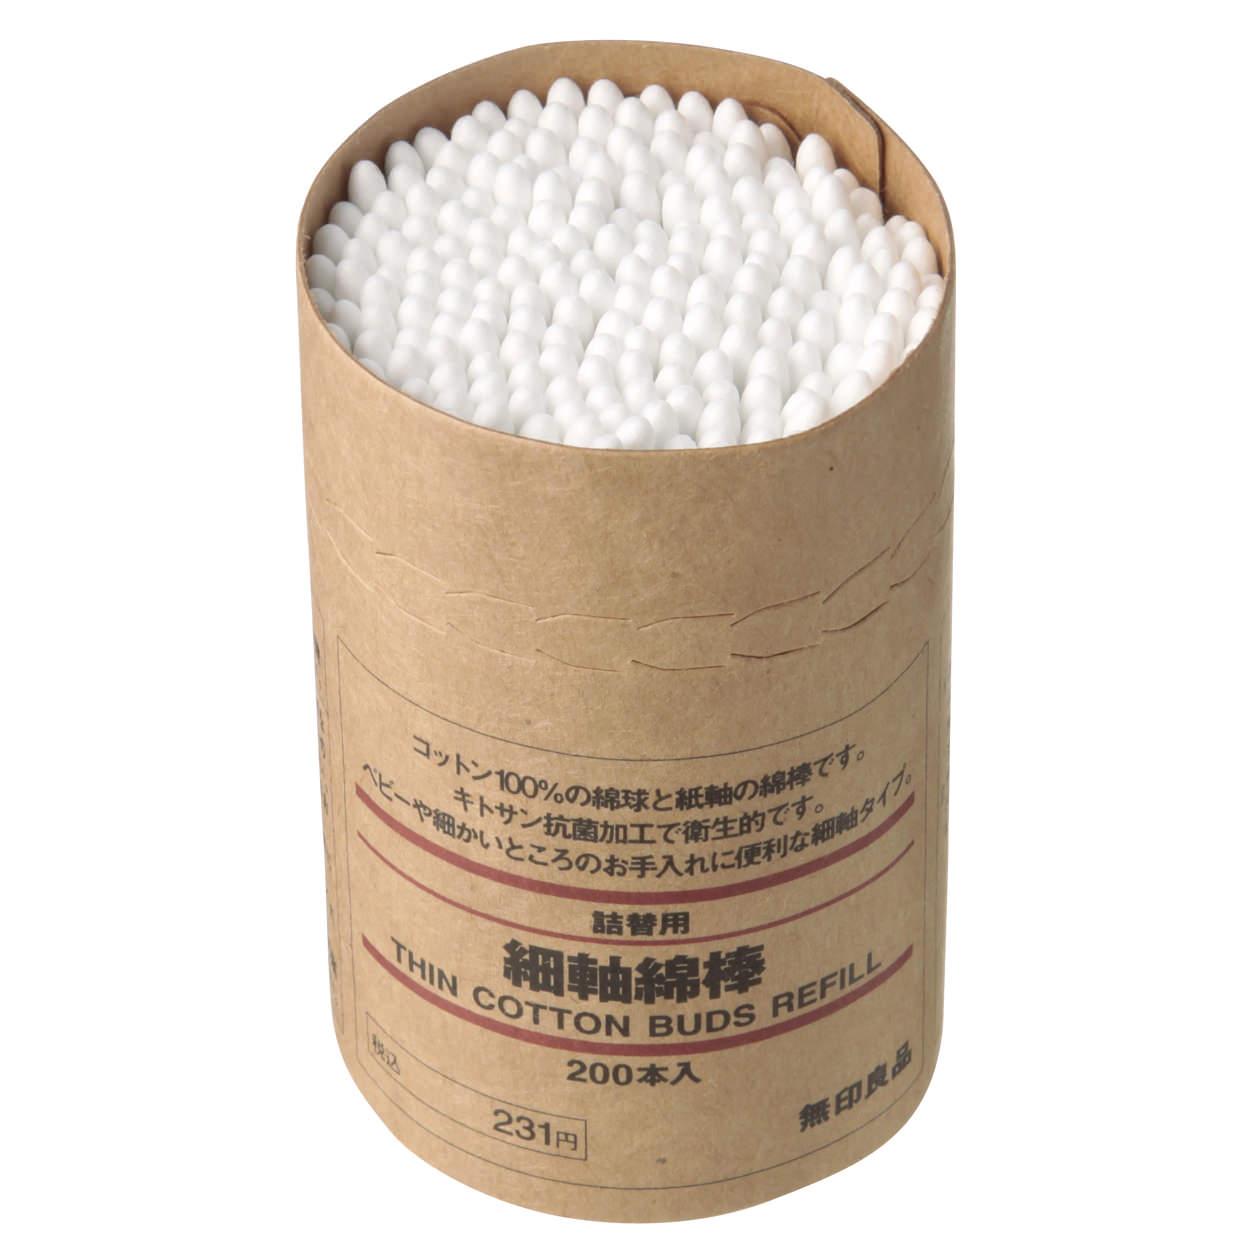 Thin cotton buds from  Muji